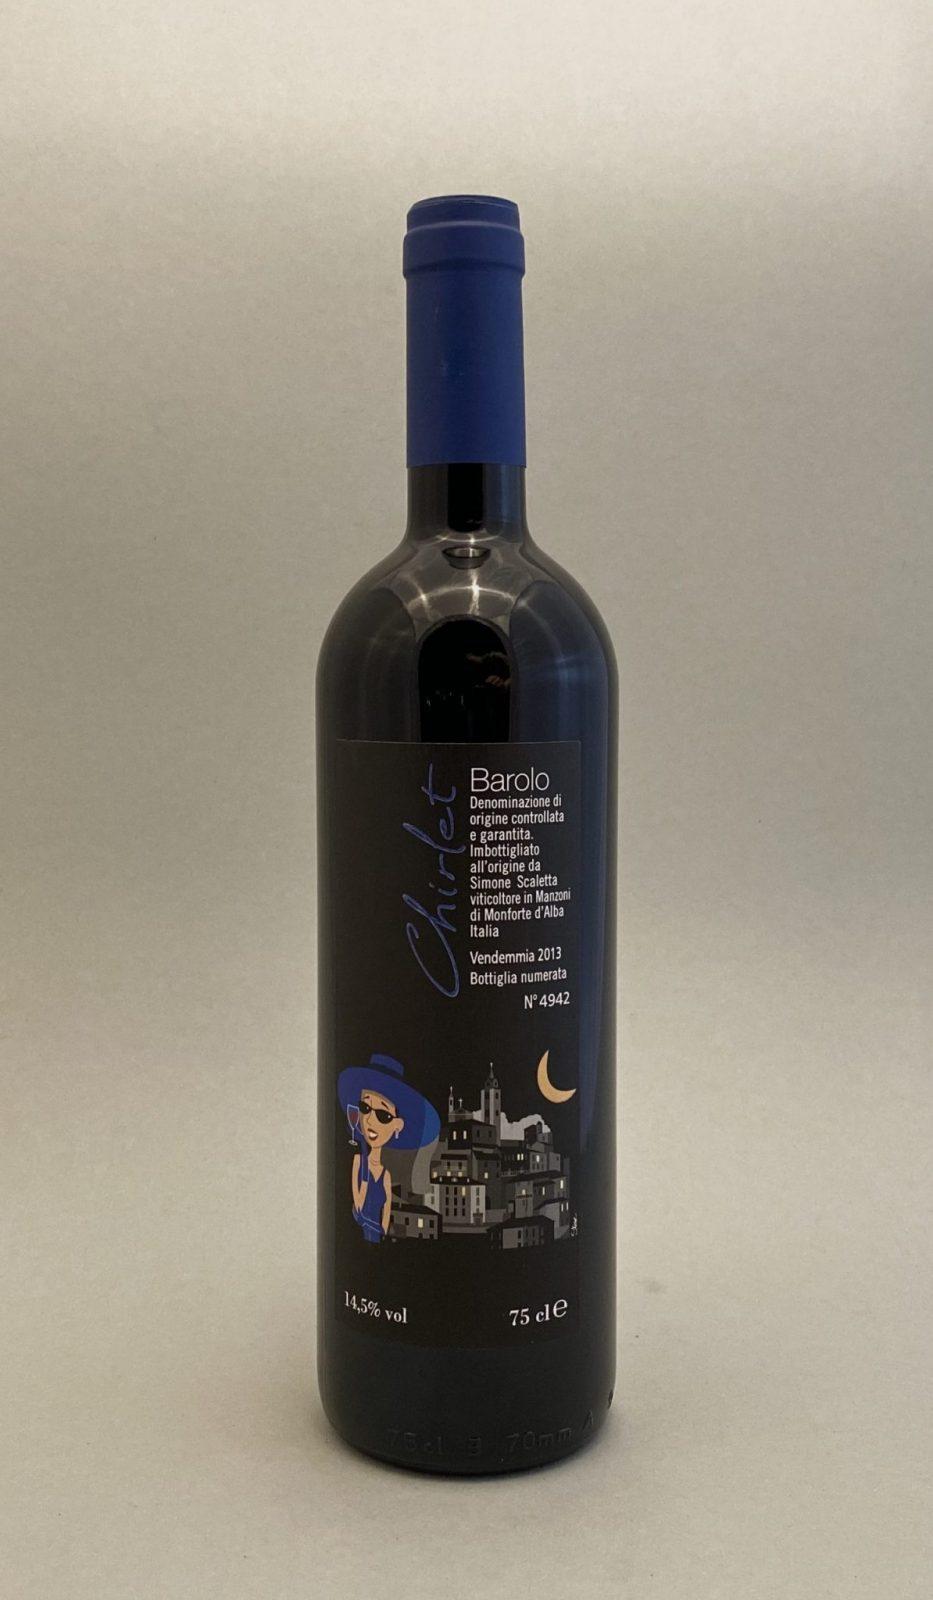 SIMONE SCALETTA Chirlet Barolo 2013, vinoteka Sunny wines slnecnice mesto, Bratislava petrzalka, vino červené z Talianska